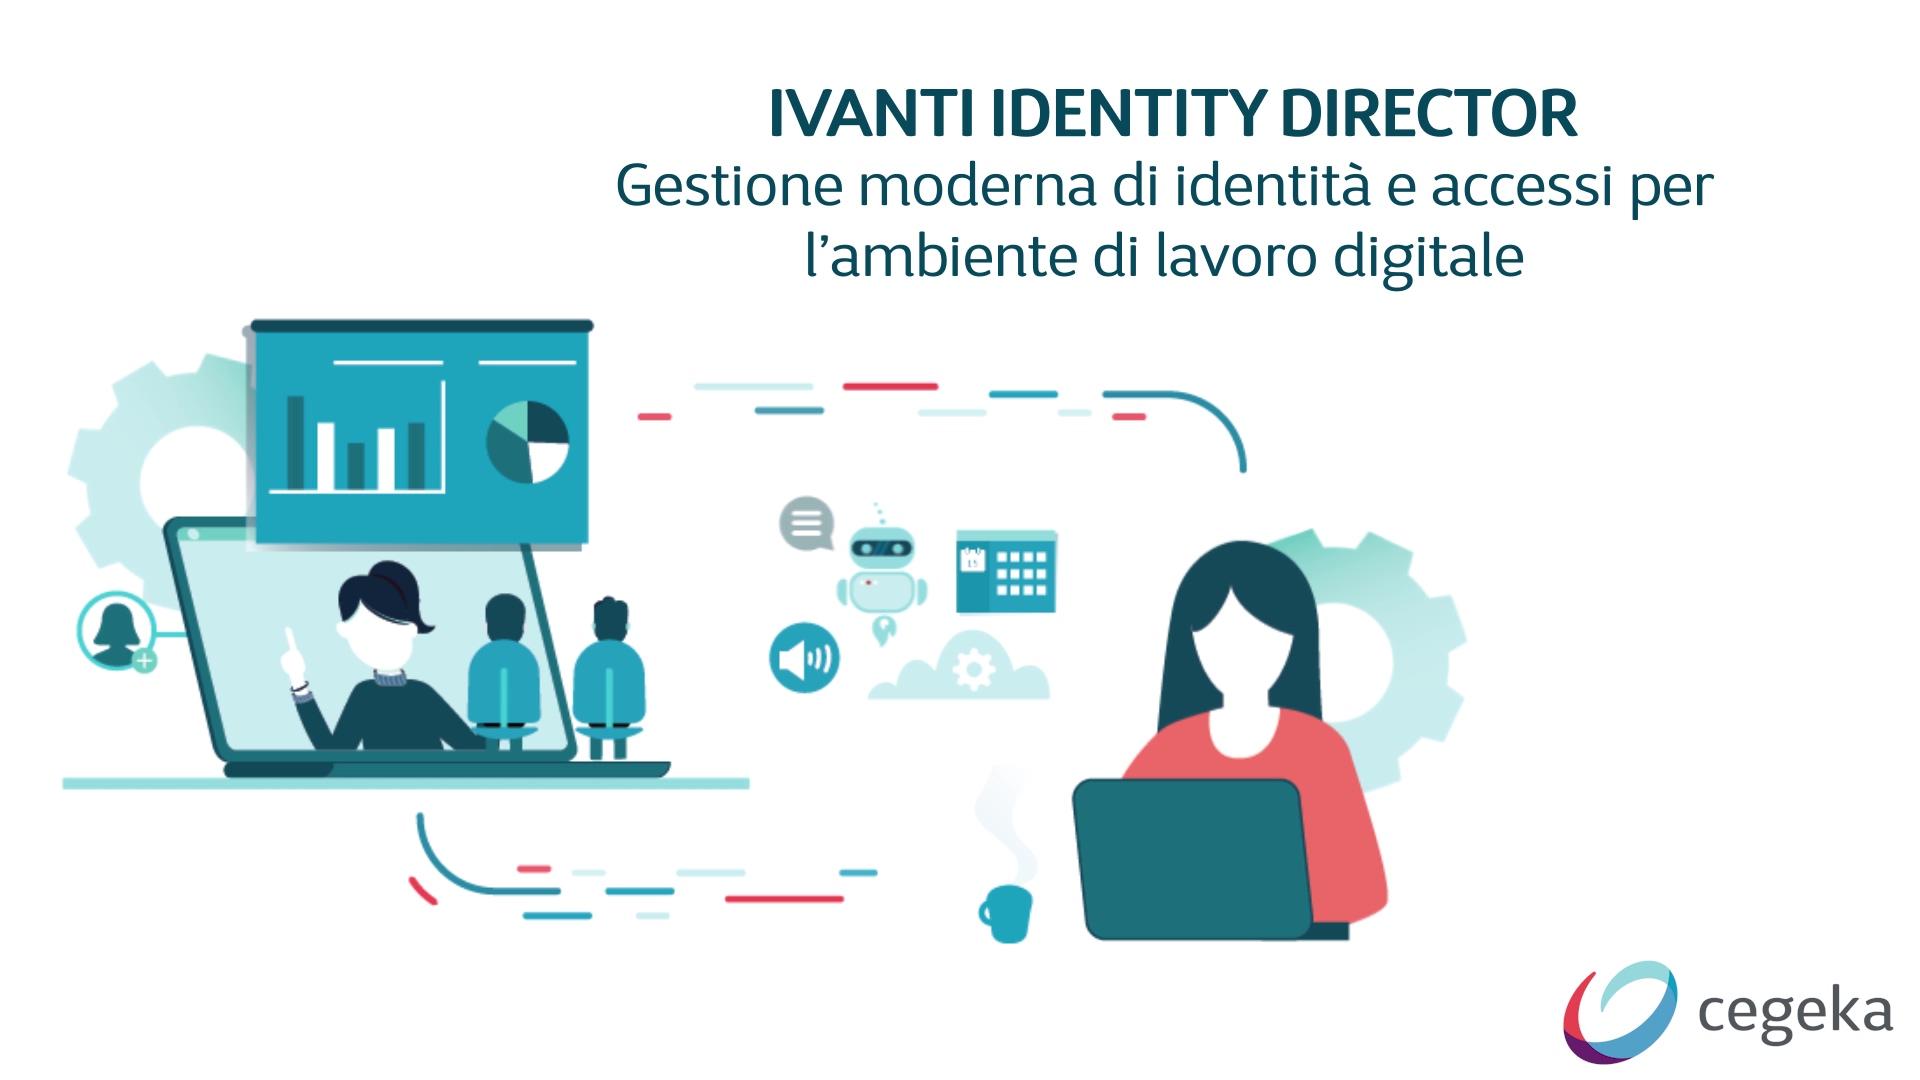 VideoCegekaIvantiIdentityDirector